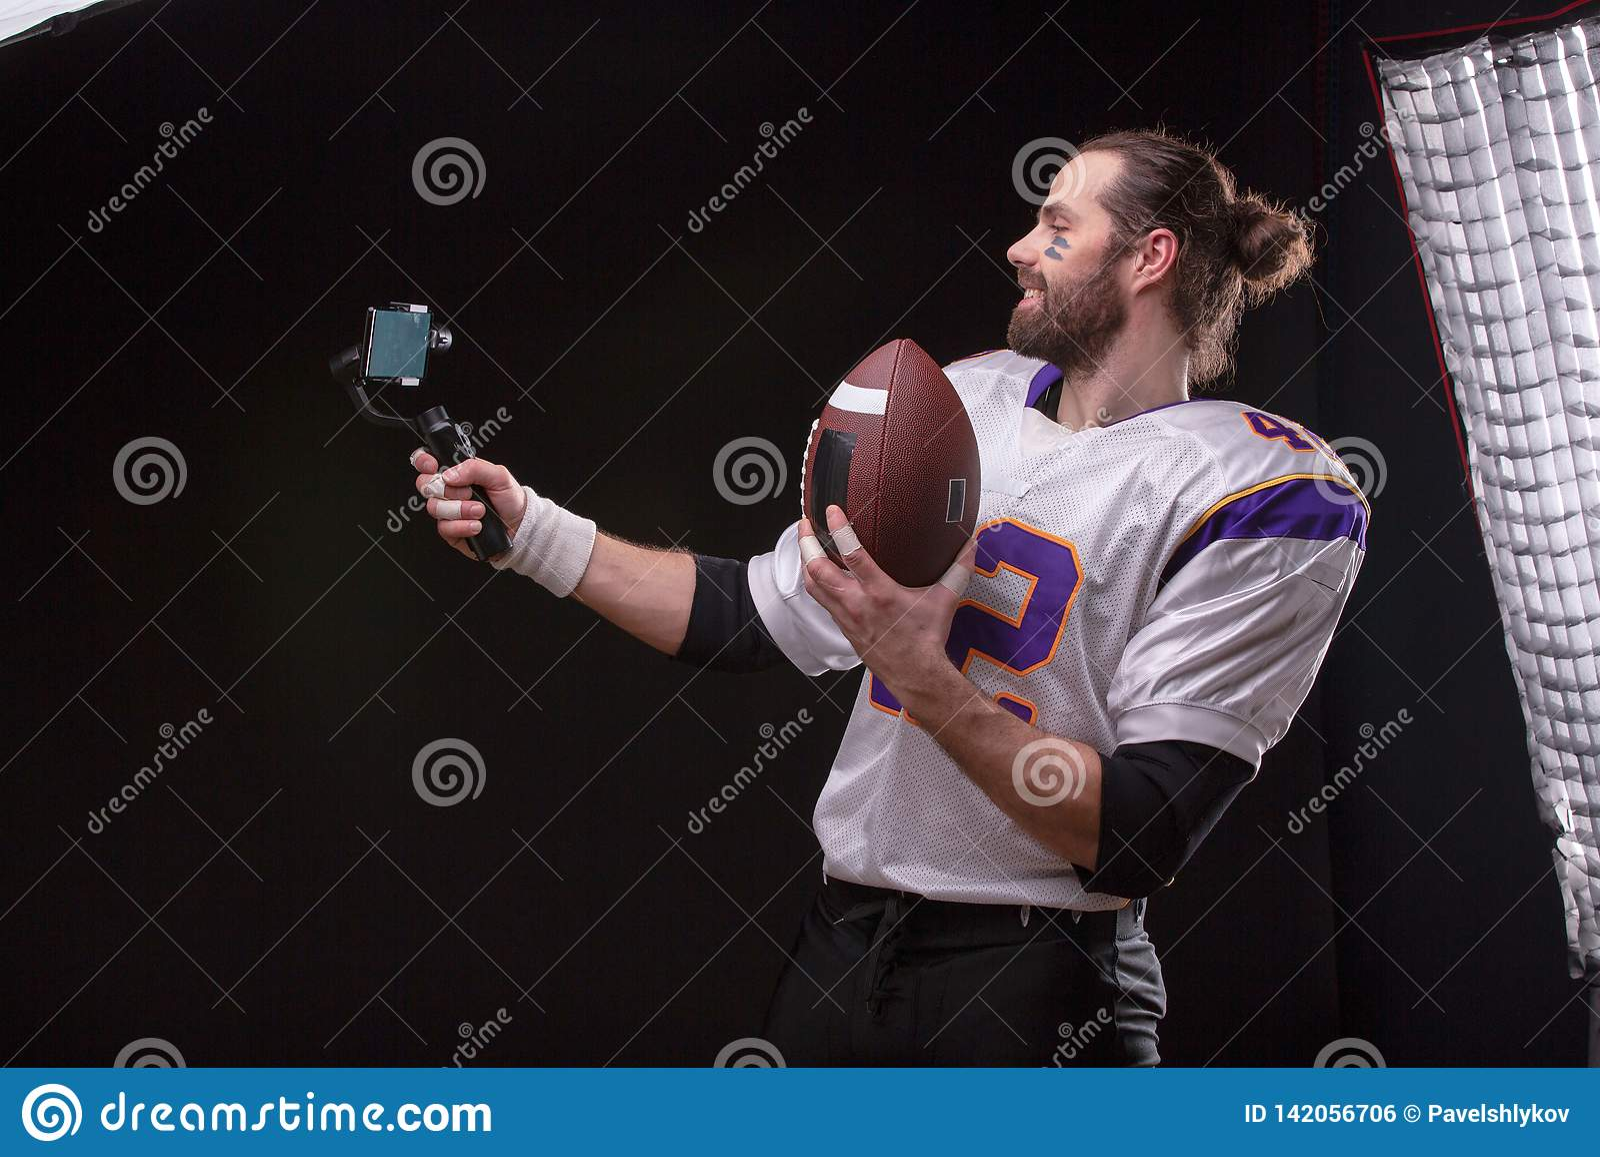 Futbolista z smartfone na gimbal